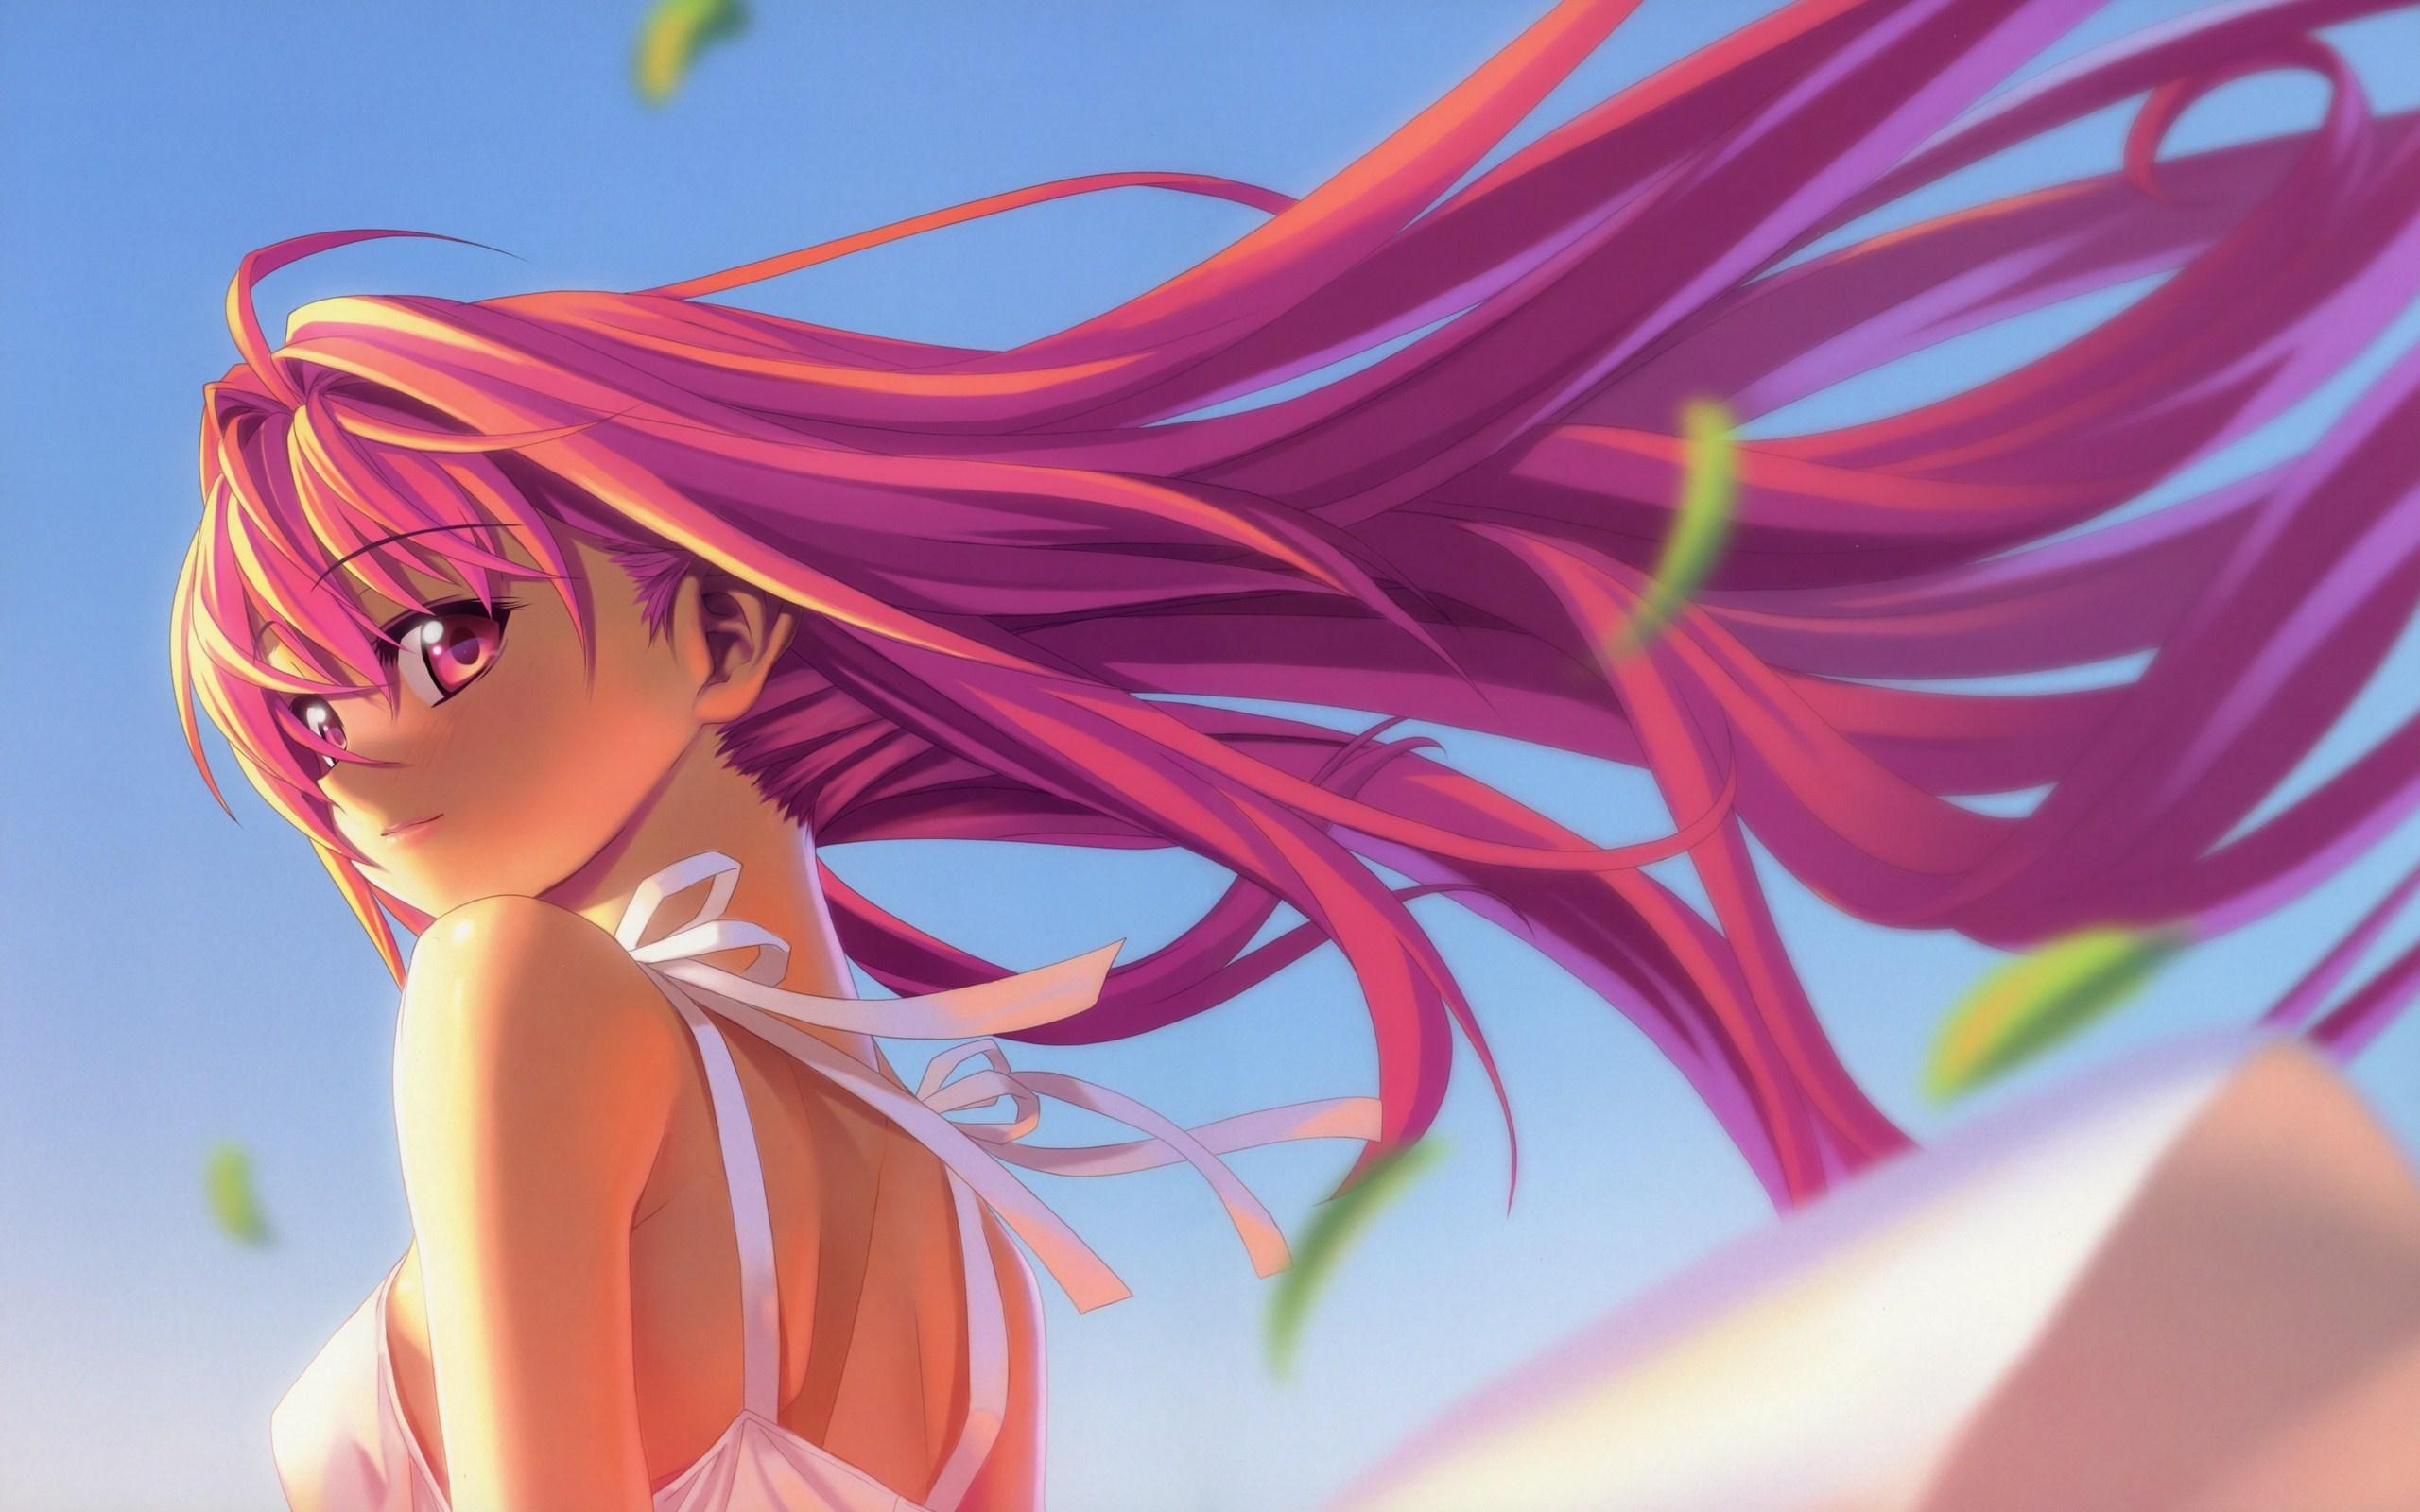 Anime girl pink hair